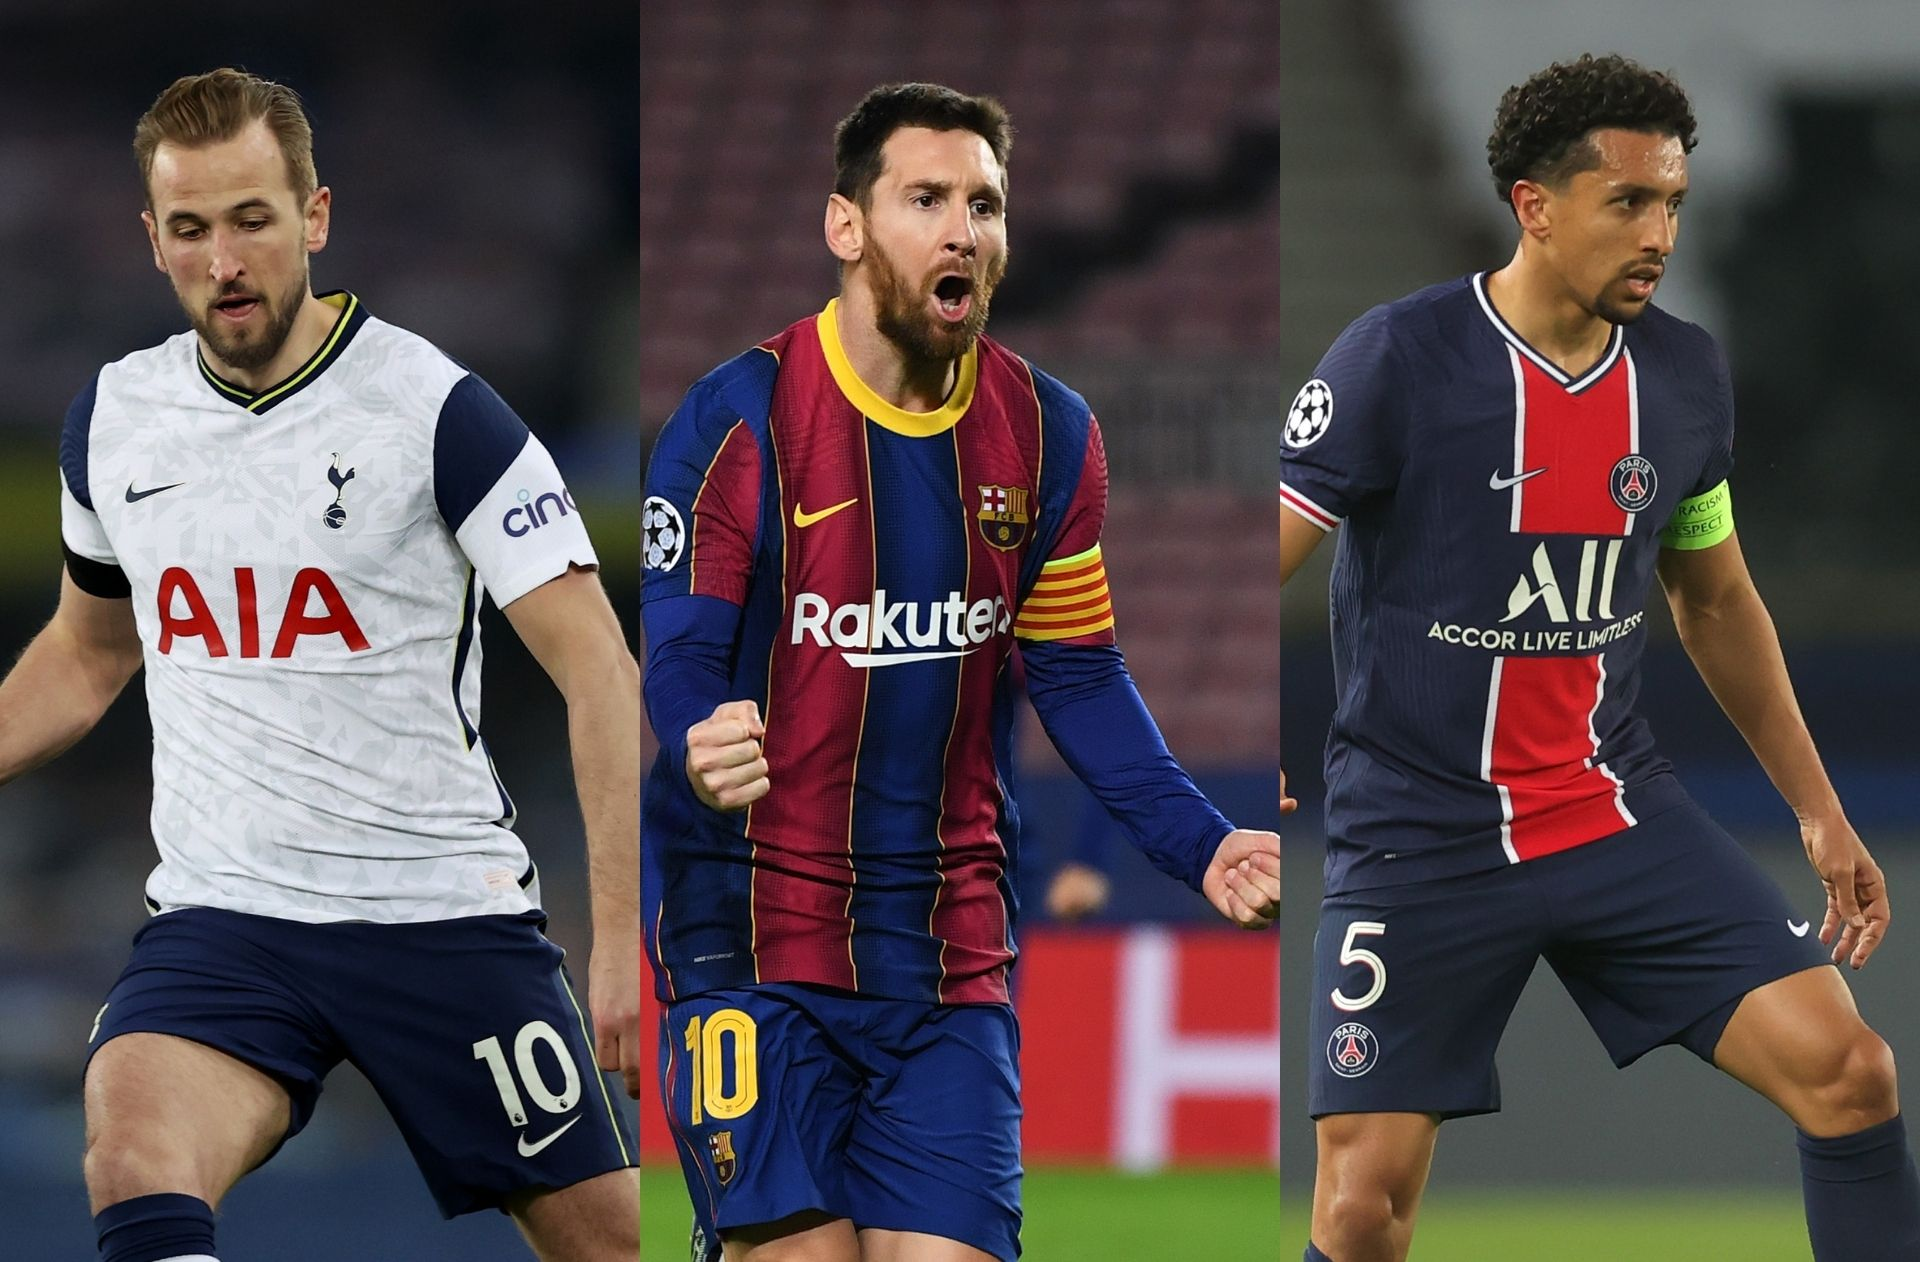 Harry Kane of Tottenham, Lionel Messi of Barcelona, Marquinhos of PSG